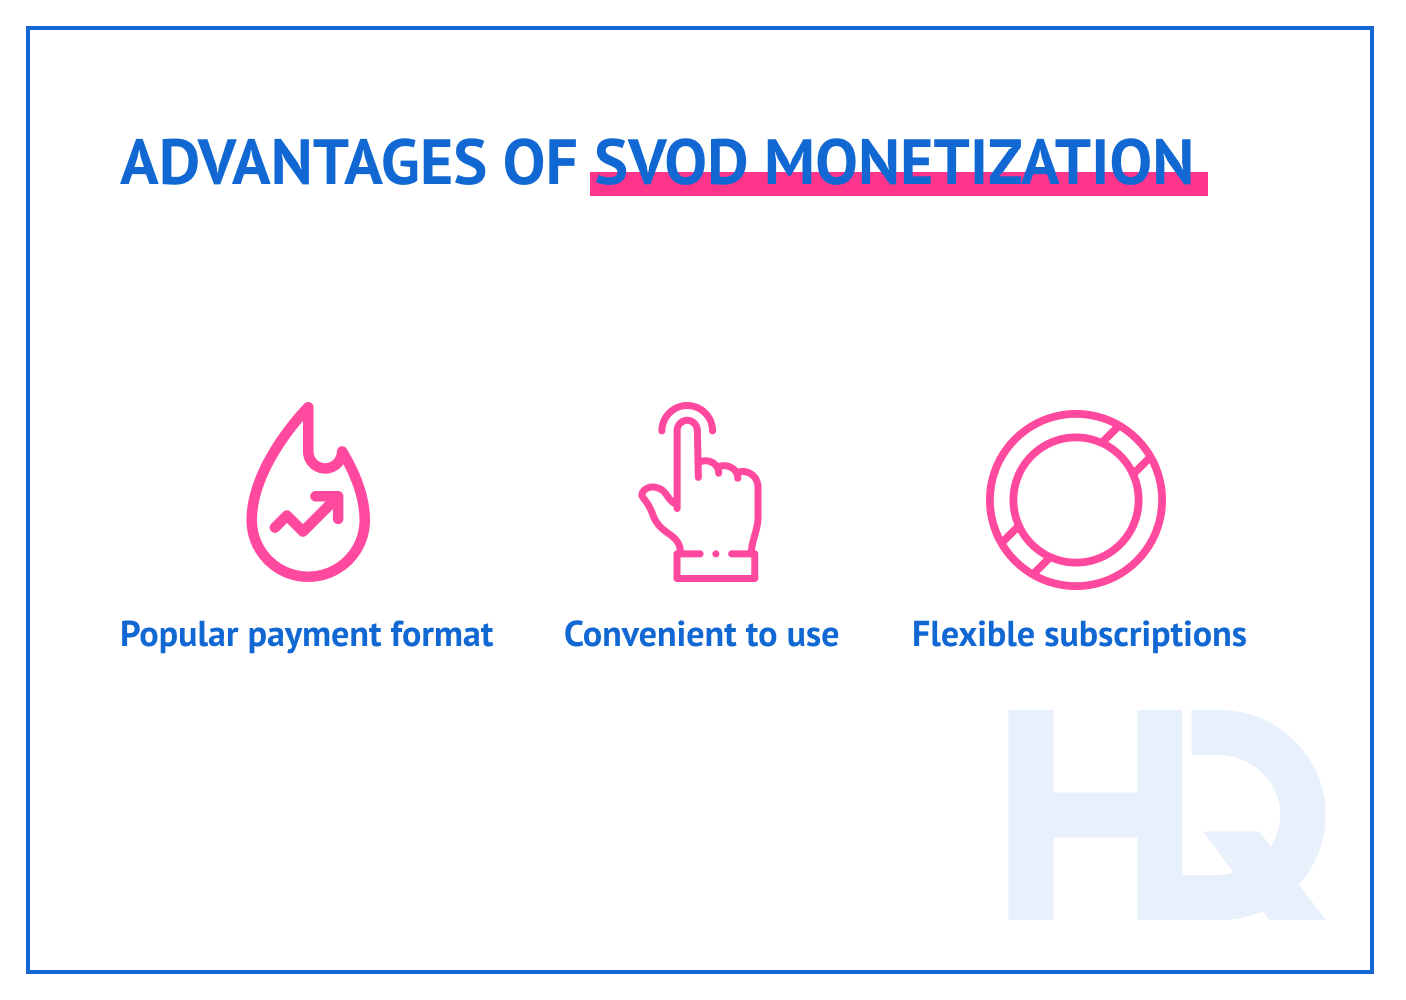 Advantages of SVoD monetization model.